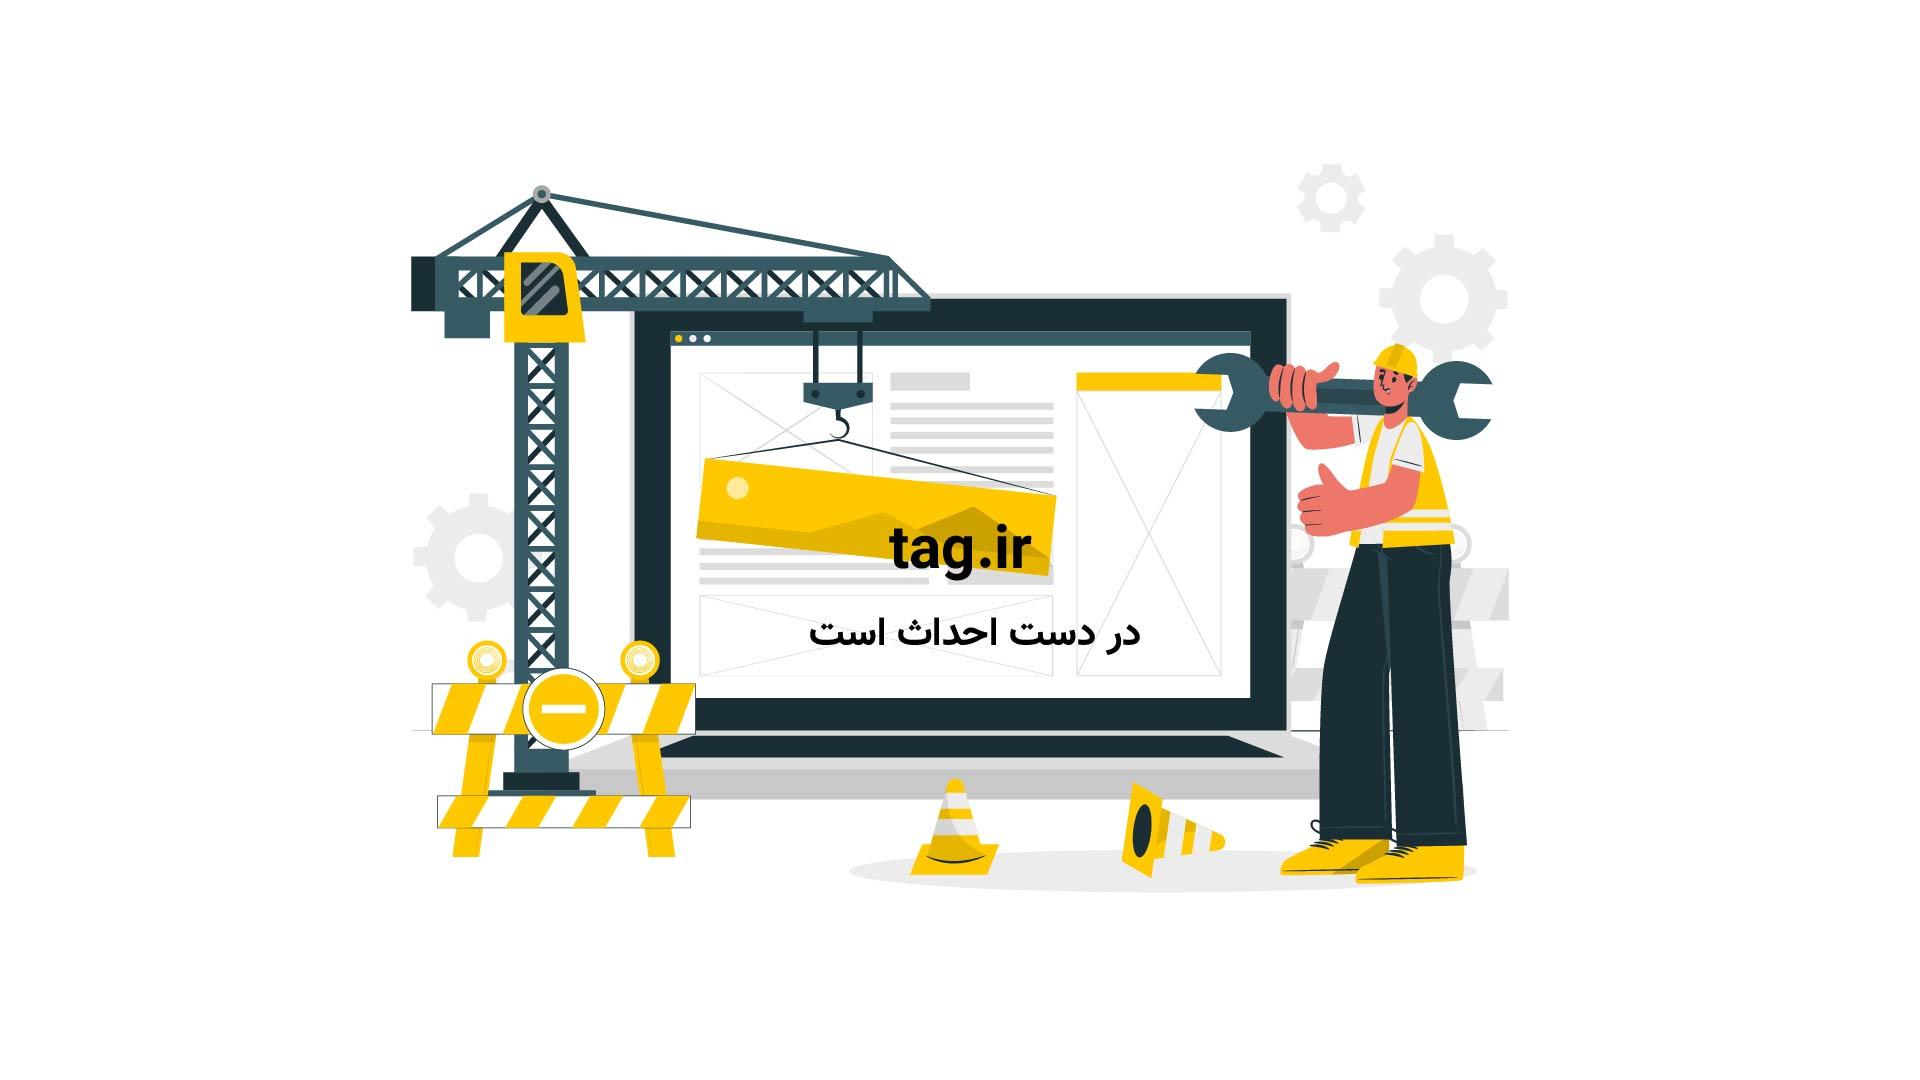 حمله تروریستی بارسلونا | تگ